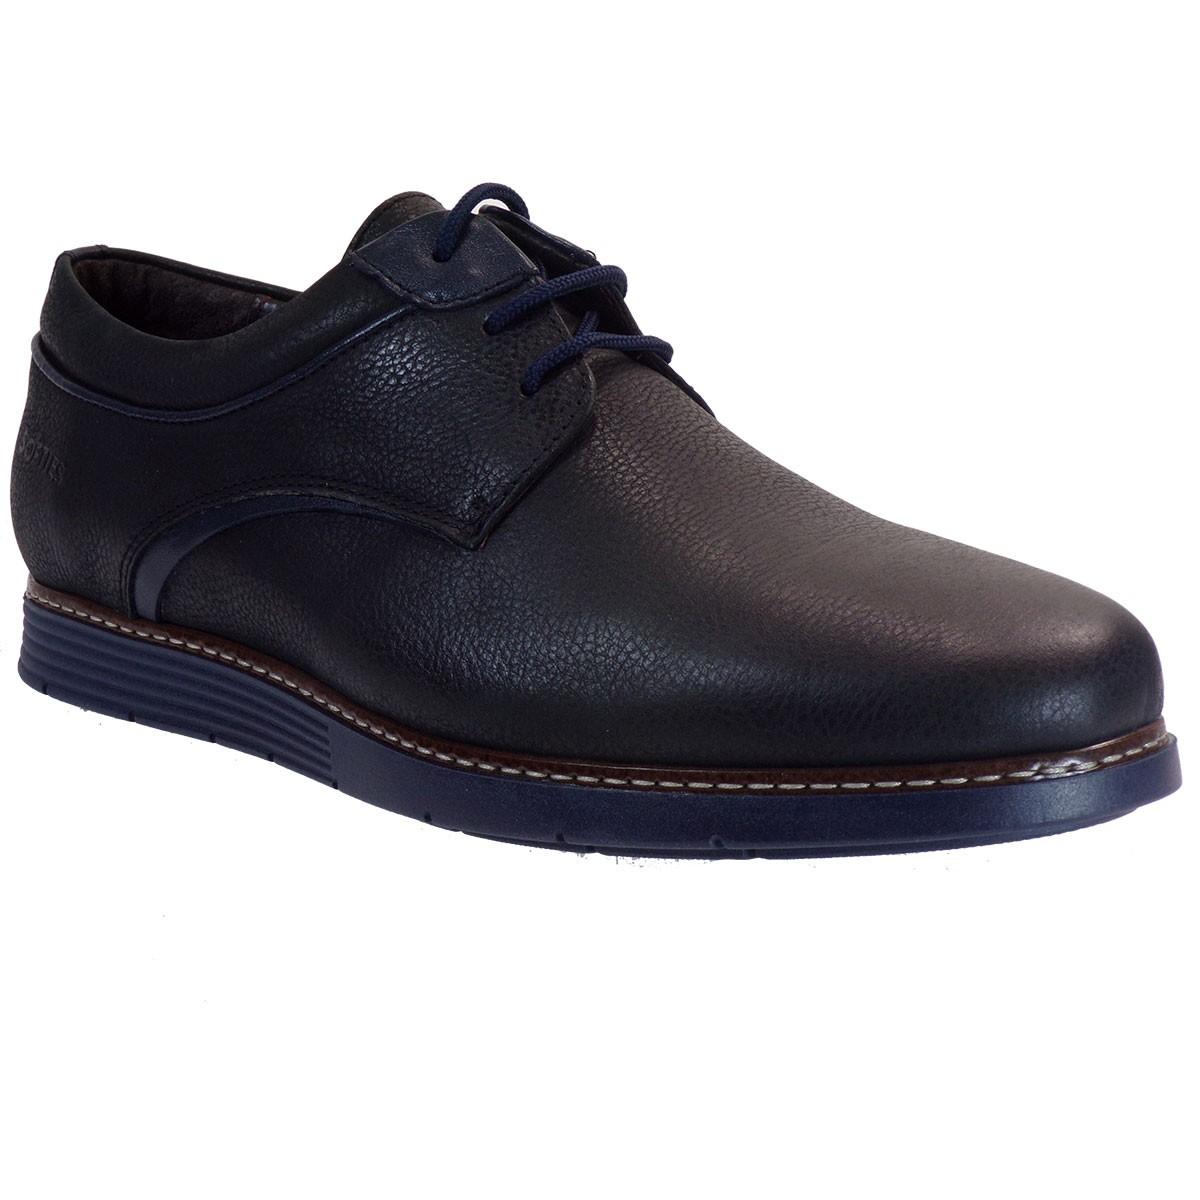 Softies Ανδρικά Παπούτσια 6993 Μαύρο Δέρμα